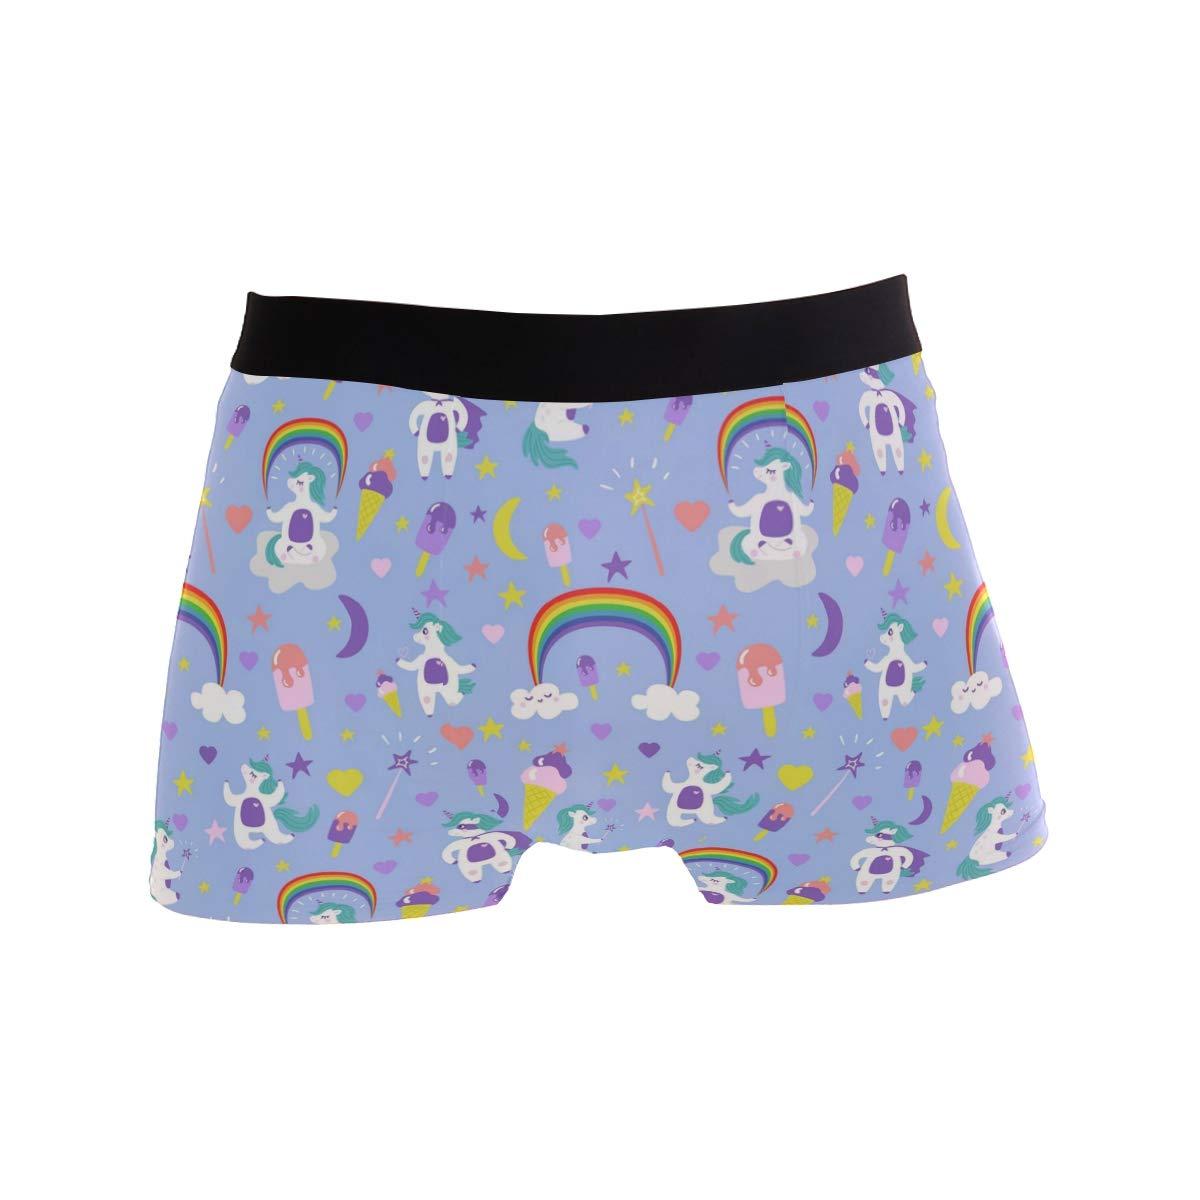 Mens Cute Cartoon Unicorn Underwear Boxer Briefs Ultra Soft Comfortable